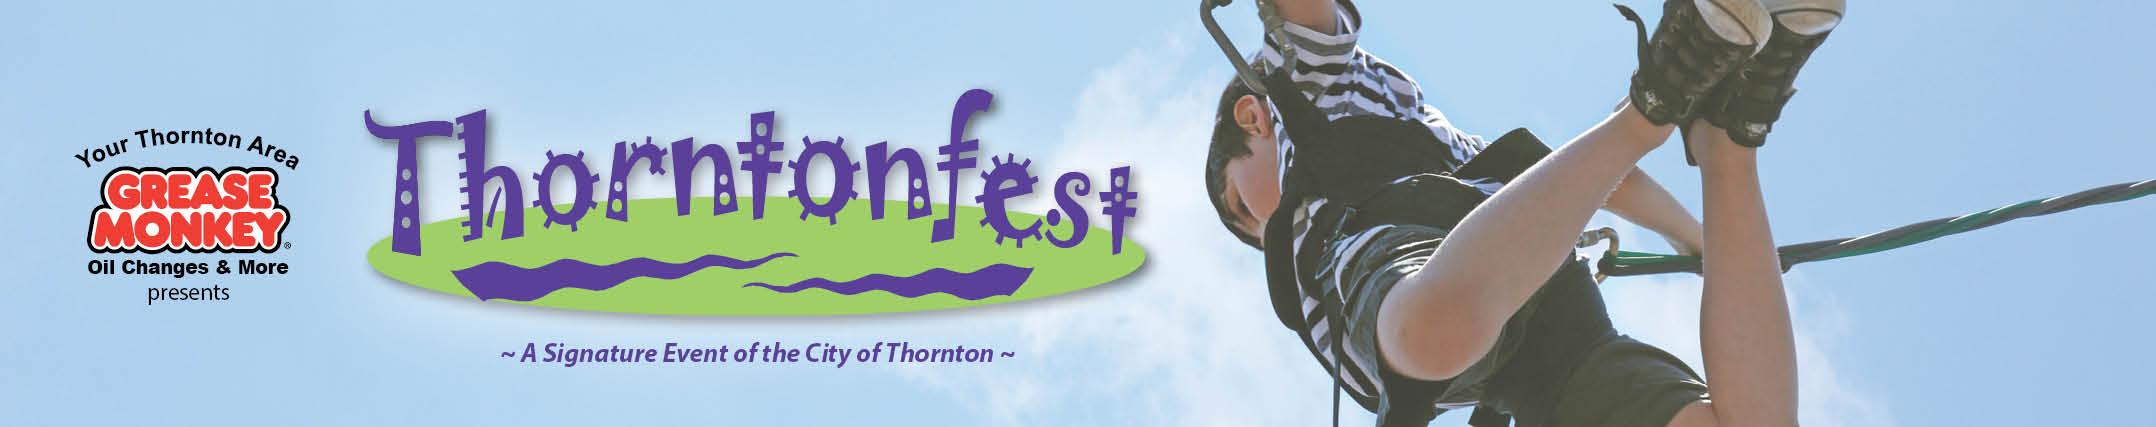 2019 Thorntonfest